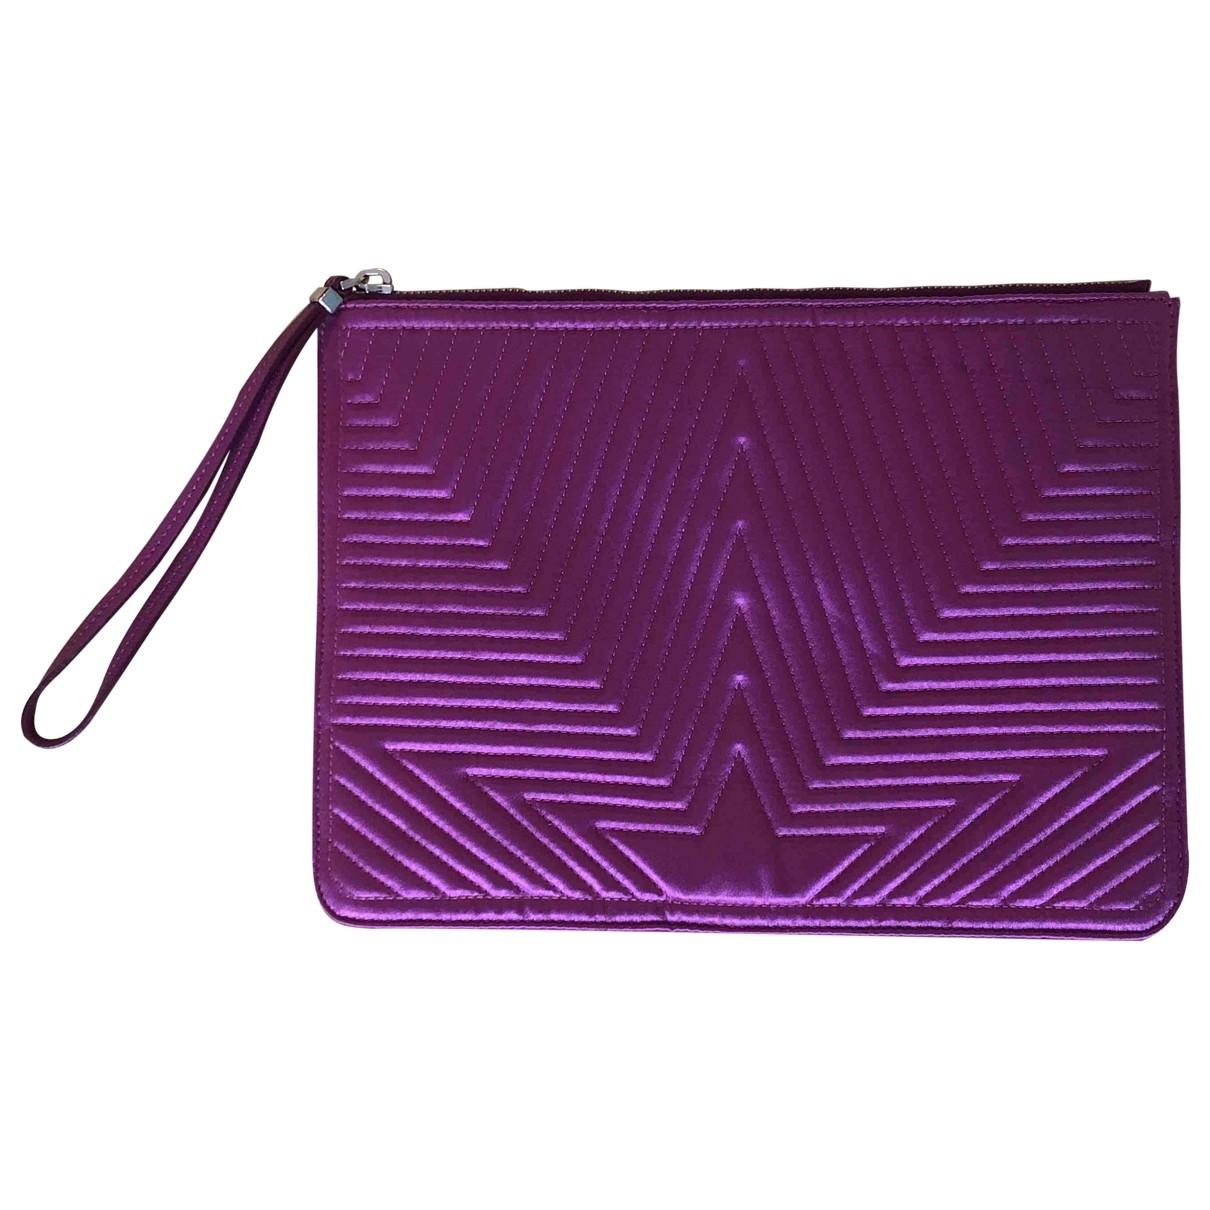 Golden Goose \N Purple Clutch bag for Women \N